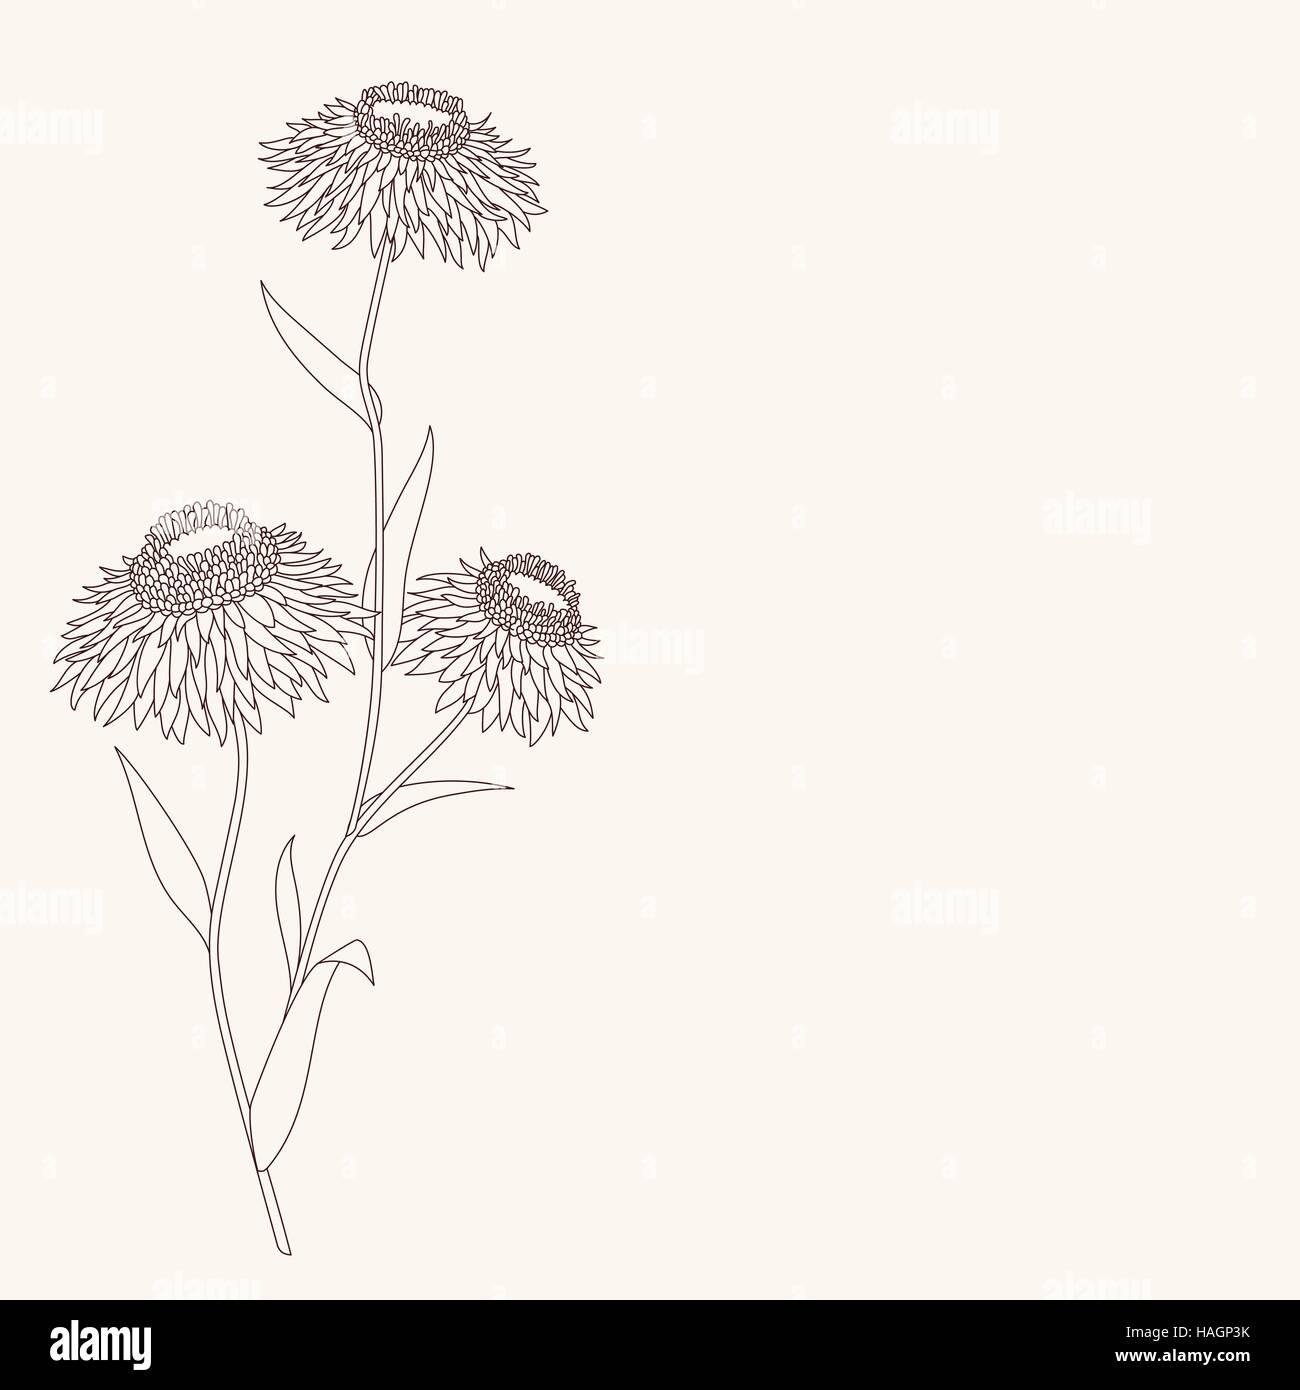 lineare blume zeichnen detaillierte vektor illustration. Black Bedroom Furniture Sets. Home Design Ideas